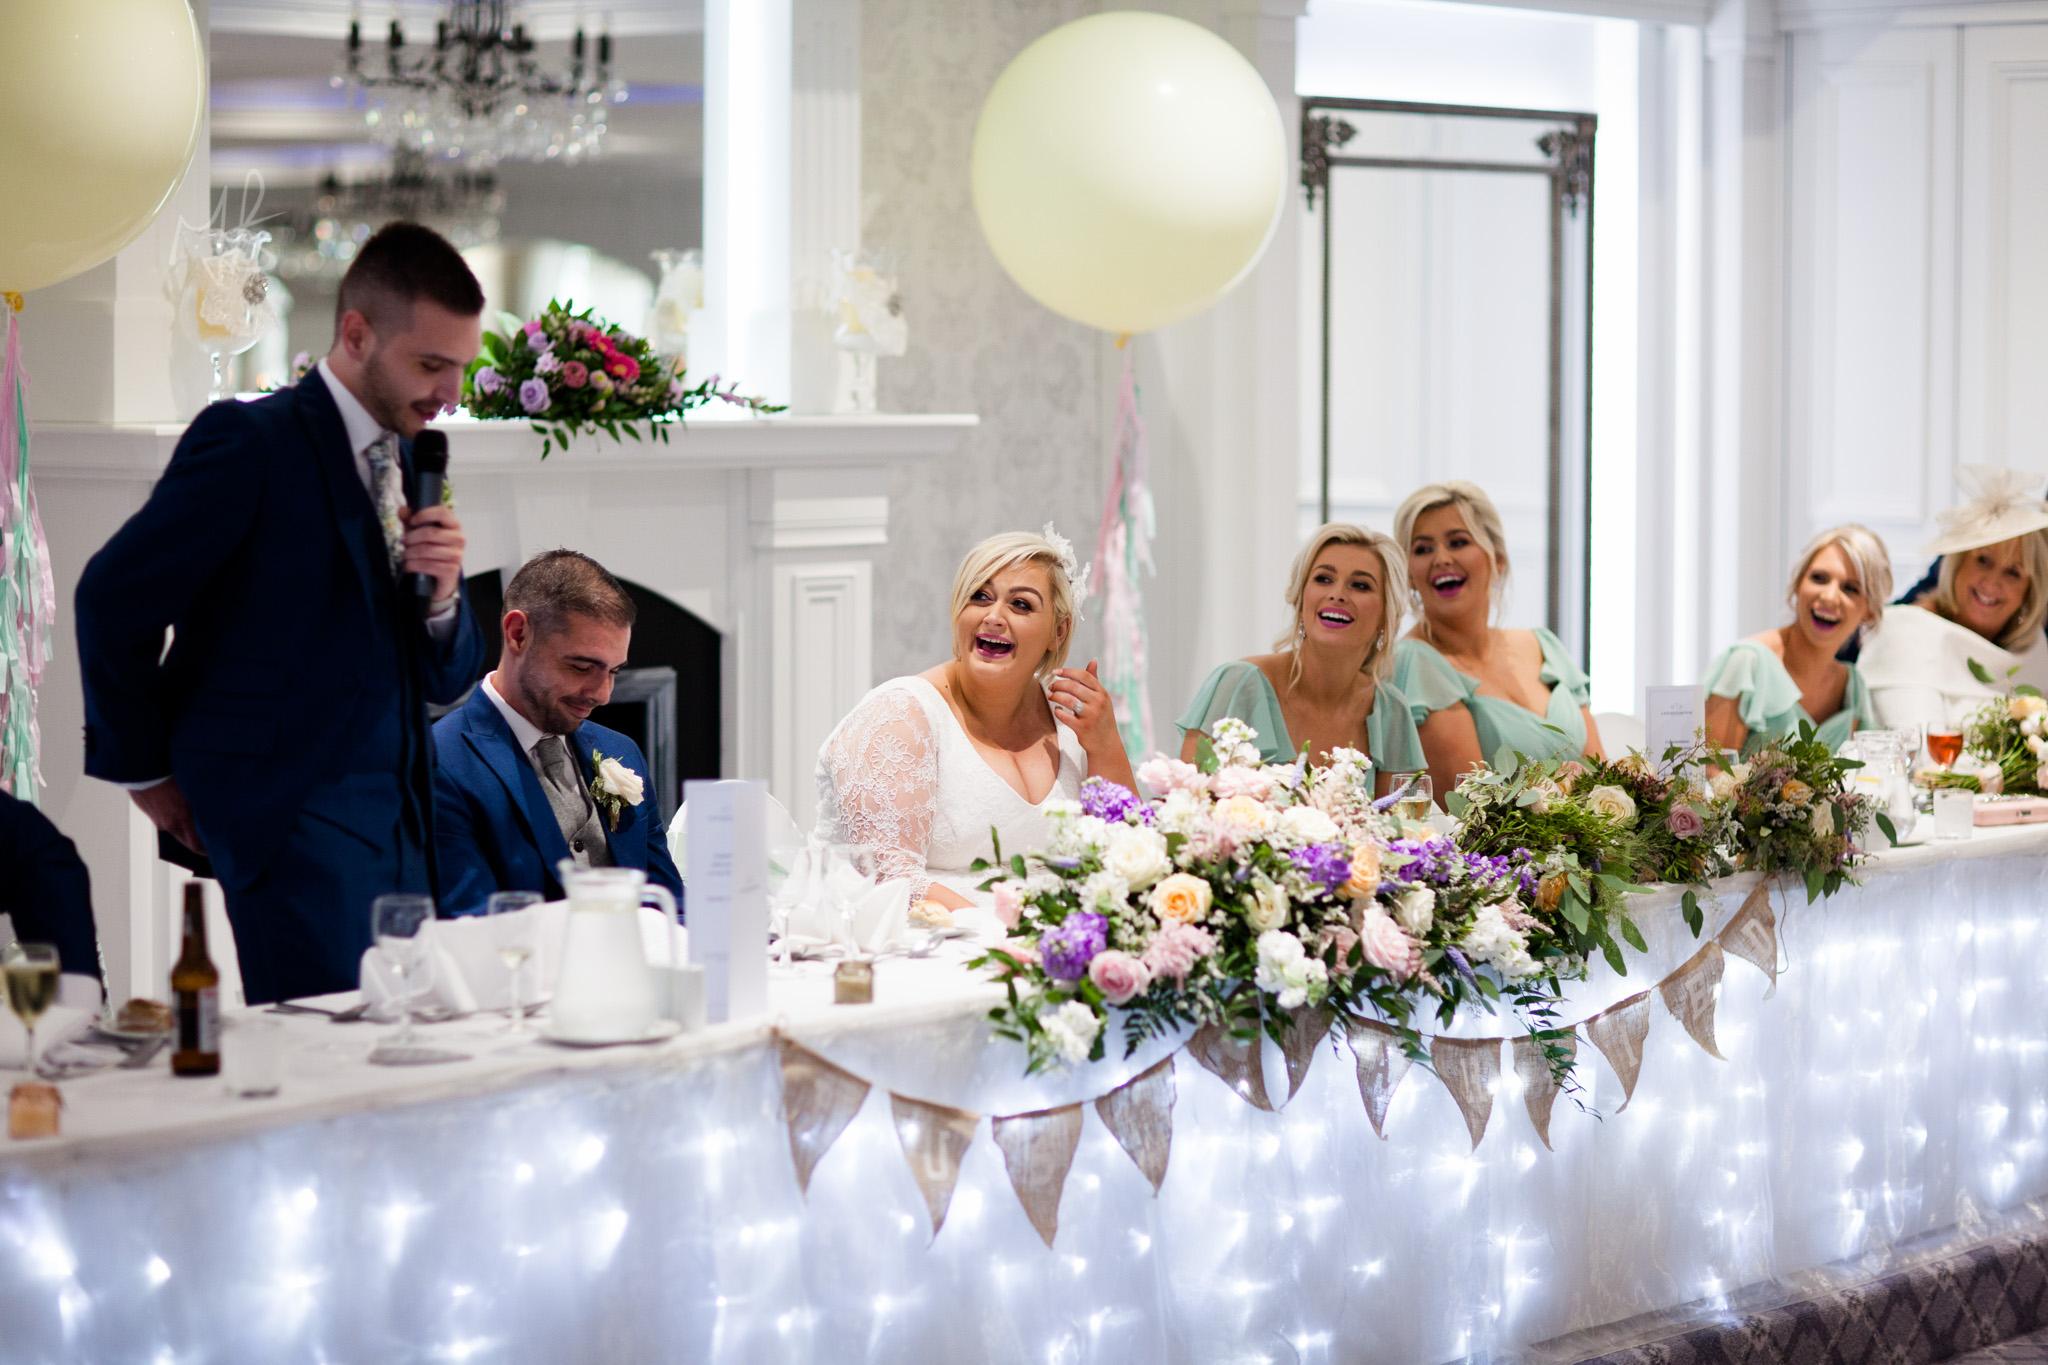 Northern-Ireland-Wedding-Photographer-Mark-Barnes-Ballymena_wedding-photography-Leighinmohr-House-Seamas_Alanna_For-web-43.jpg